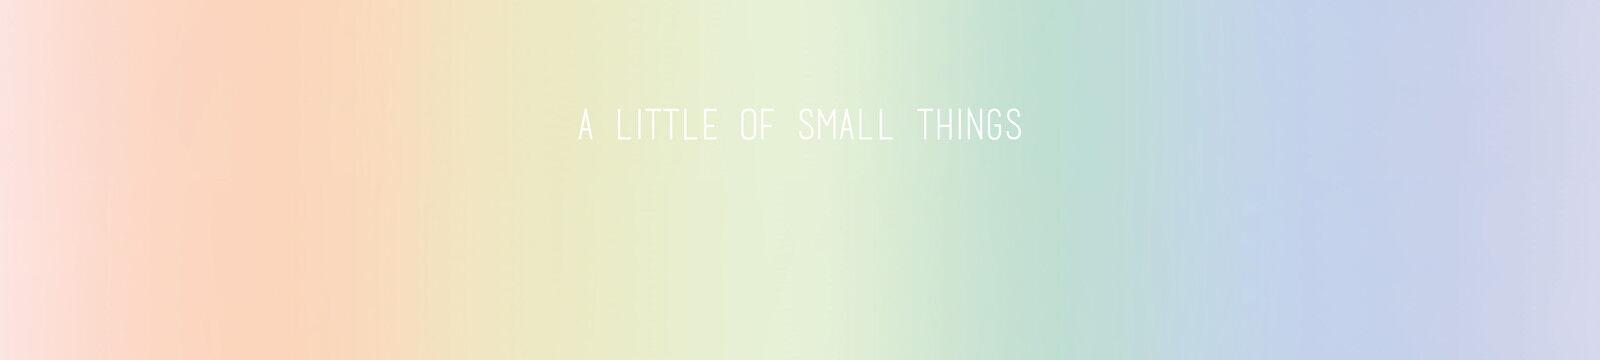 littlesmall